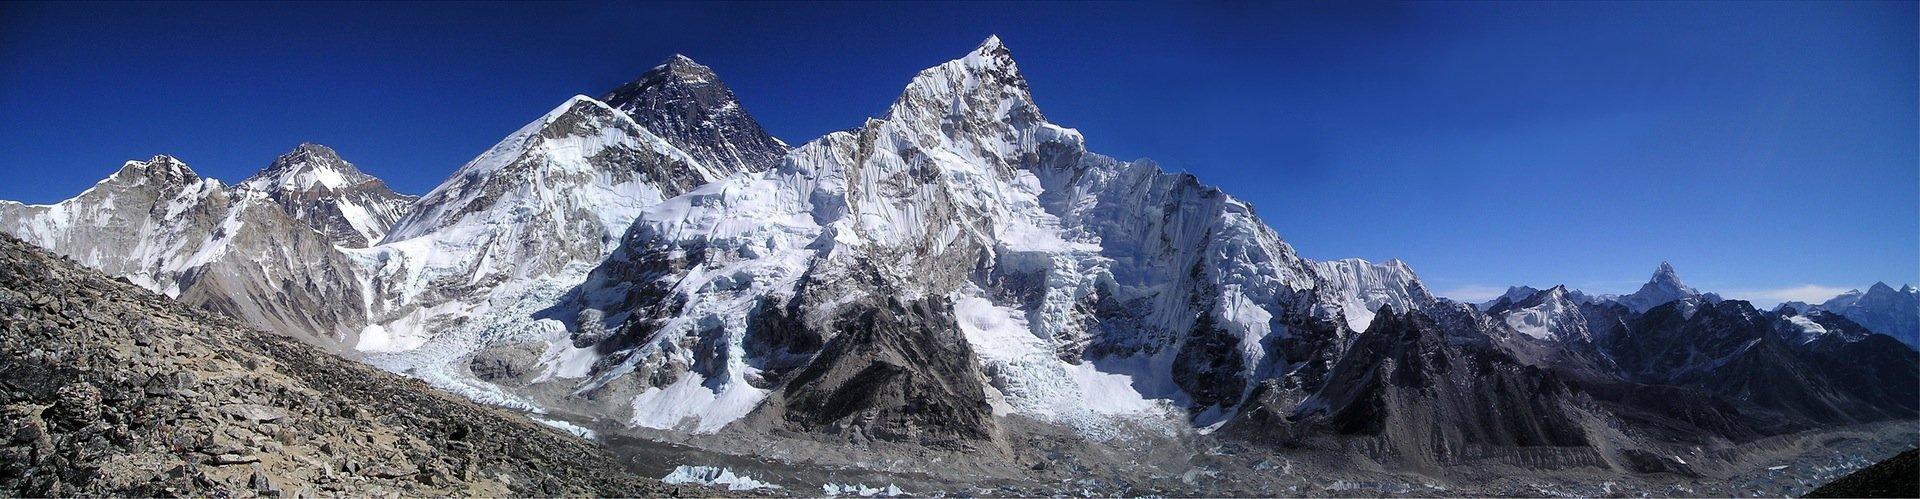 Mt.Everest, wonder of Nepal